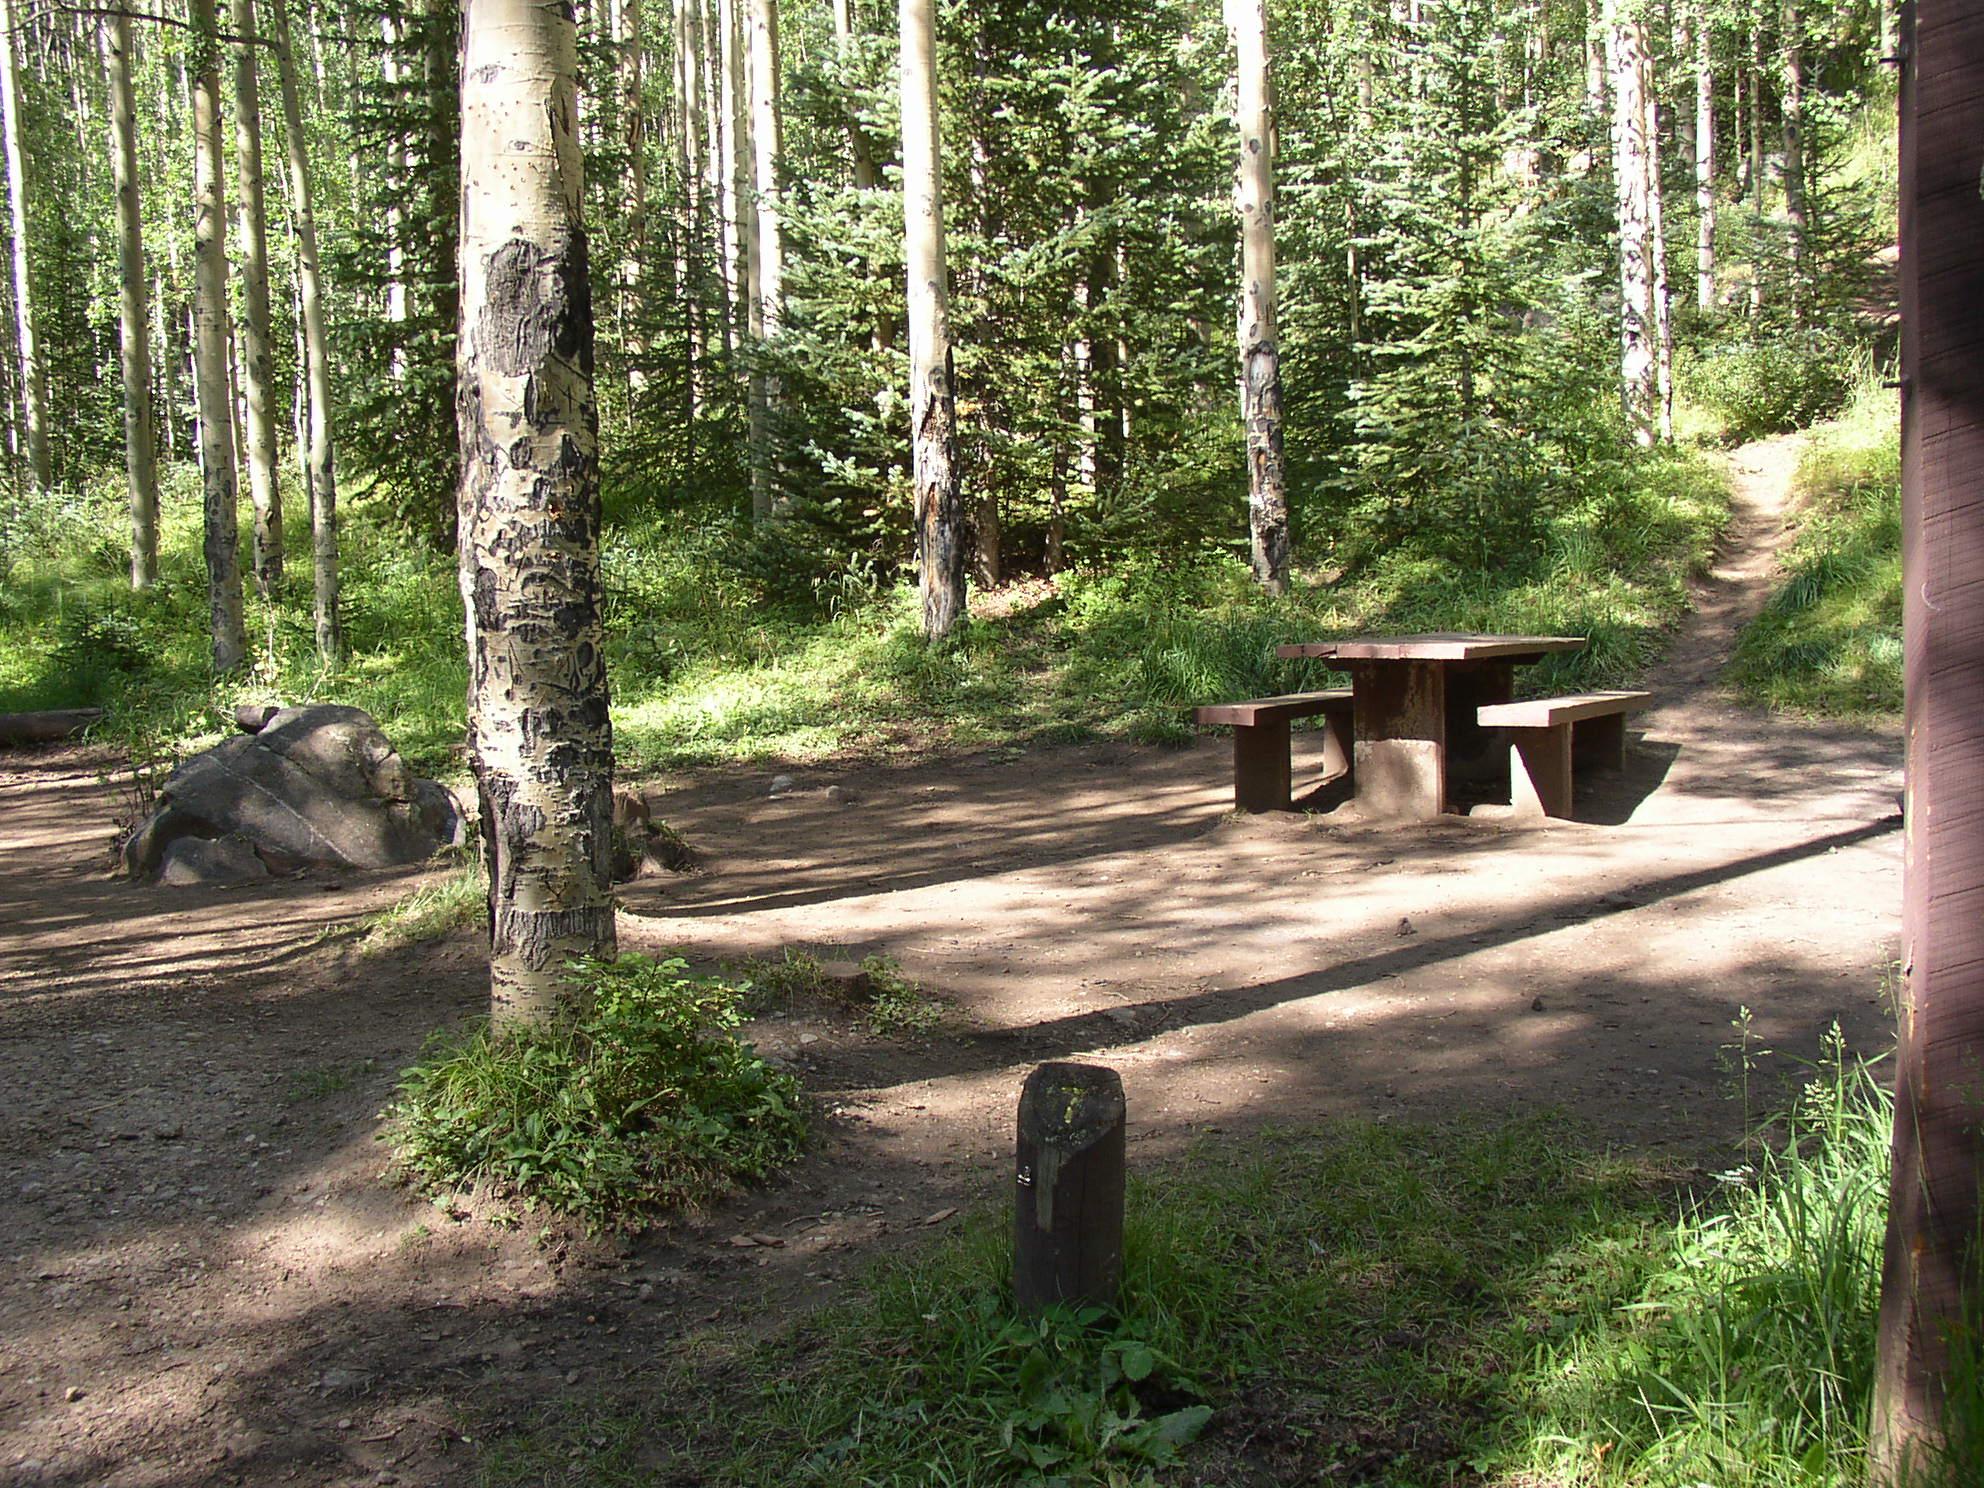 Shady mountain camping